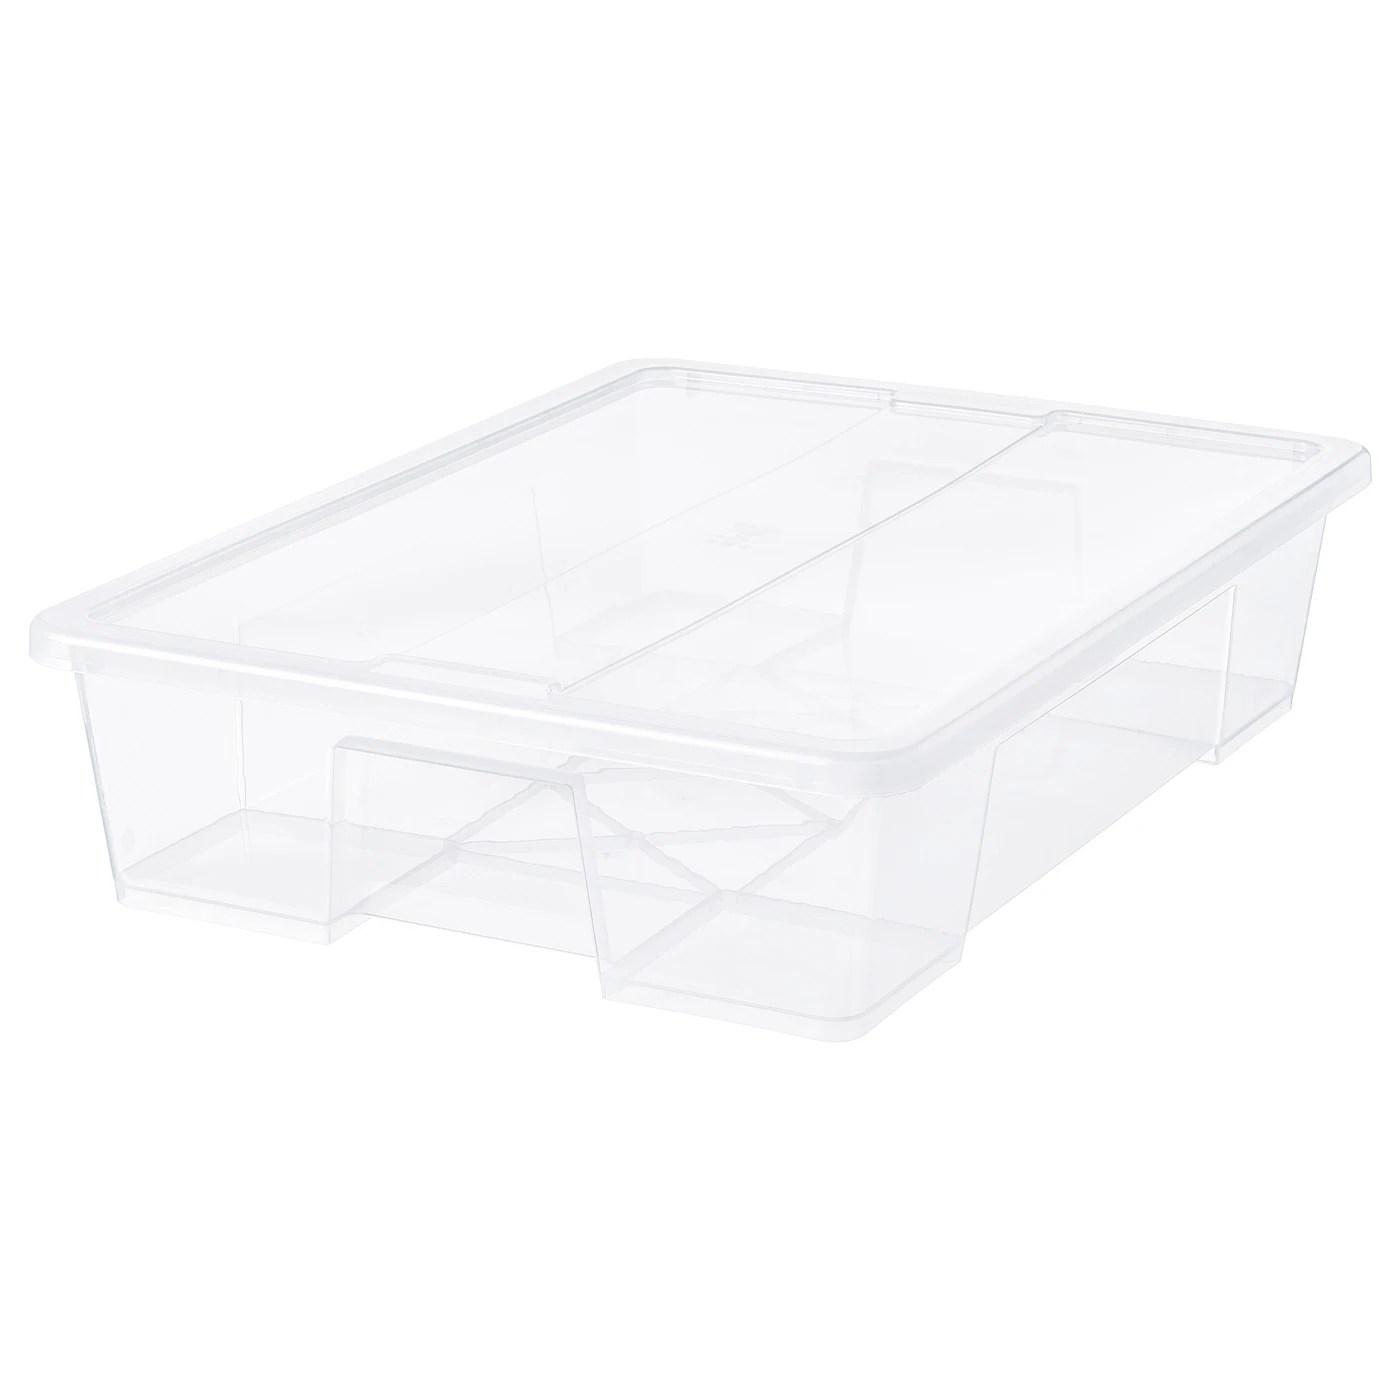 Samla Boks Med Lag Transparent 79x57x18 Cm 55 L Ikea